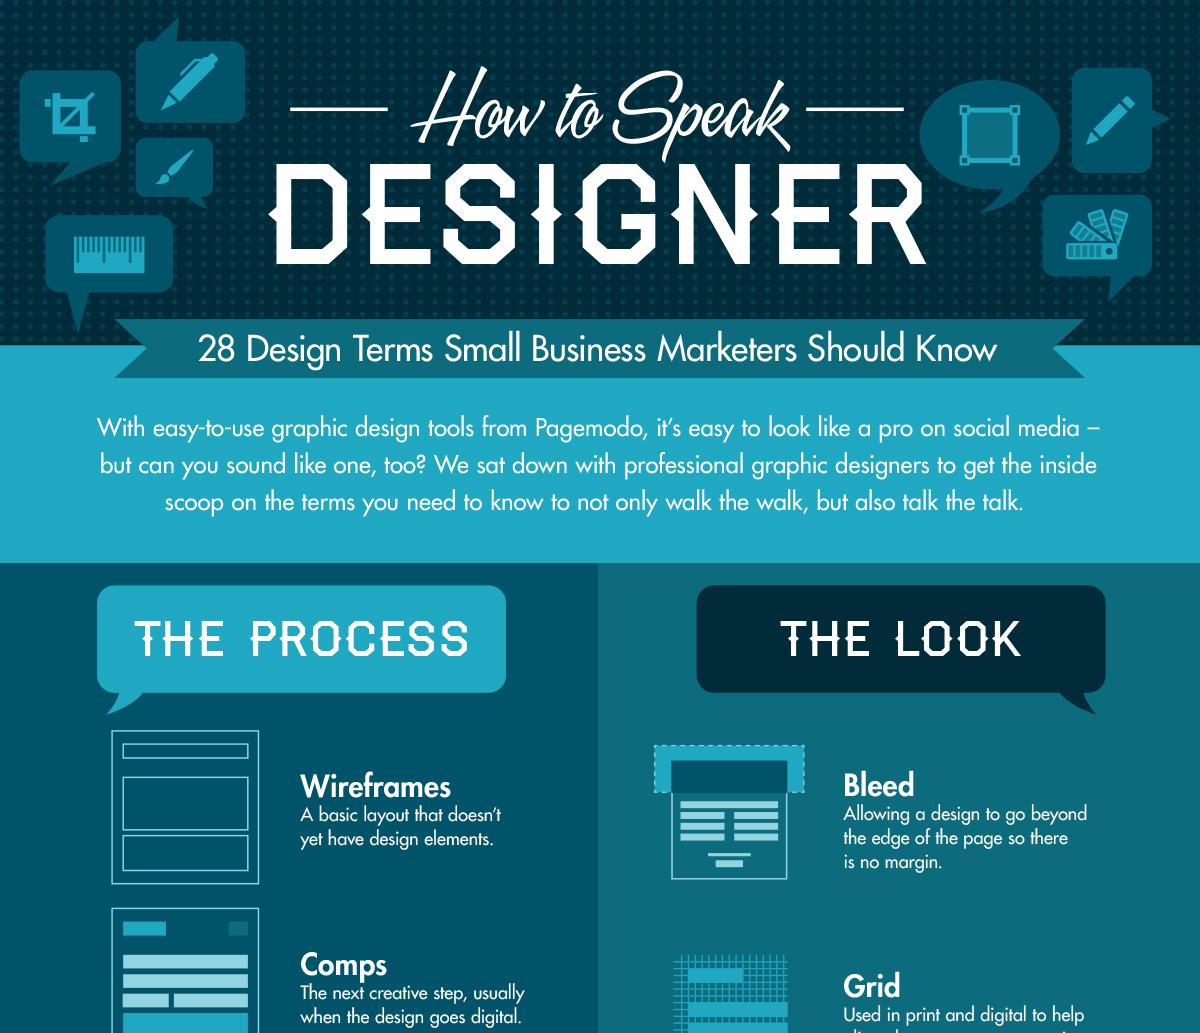 20150226-Pagemodo-How-to-Speak-Designer-